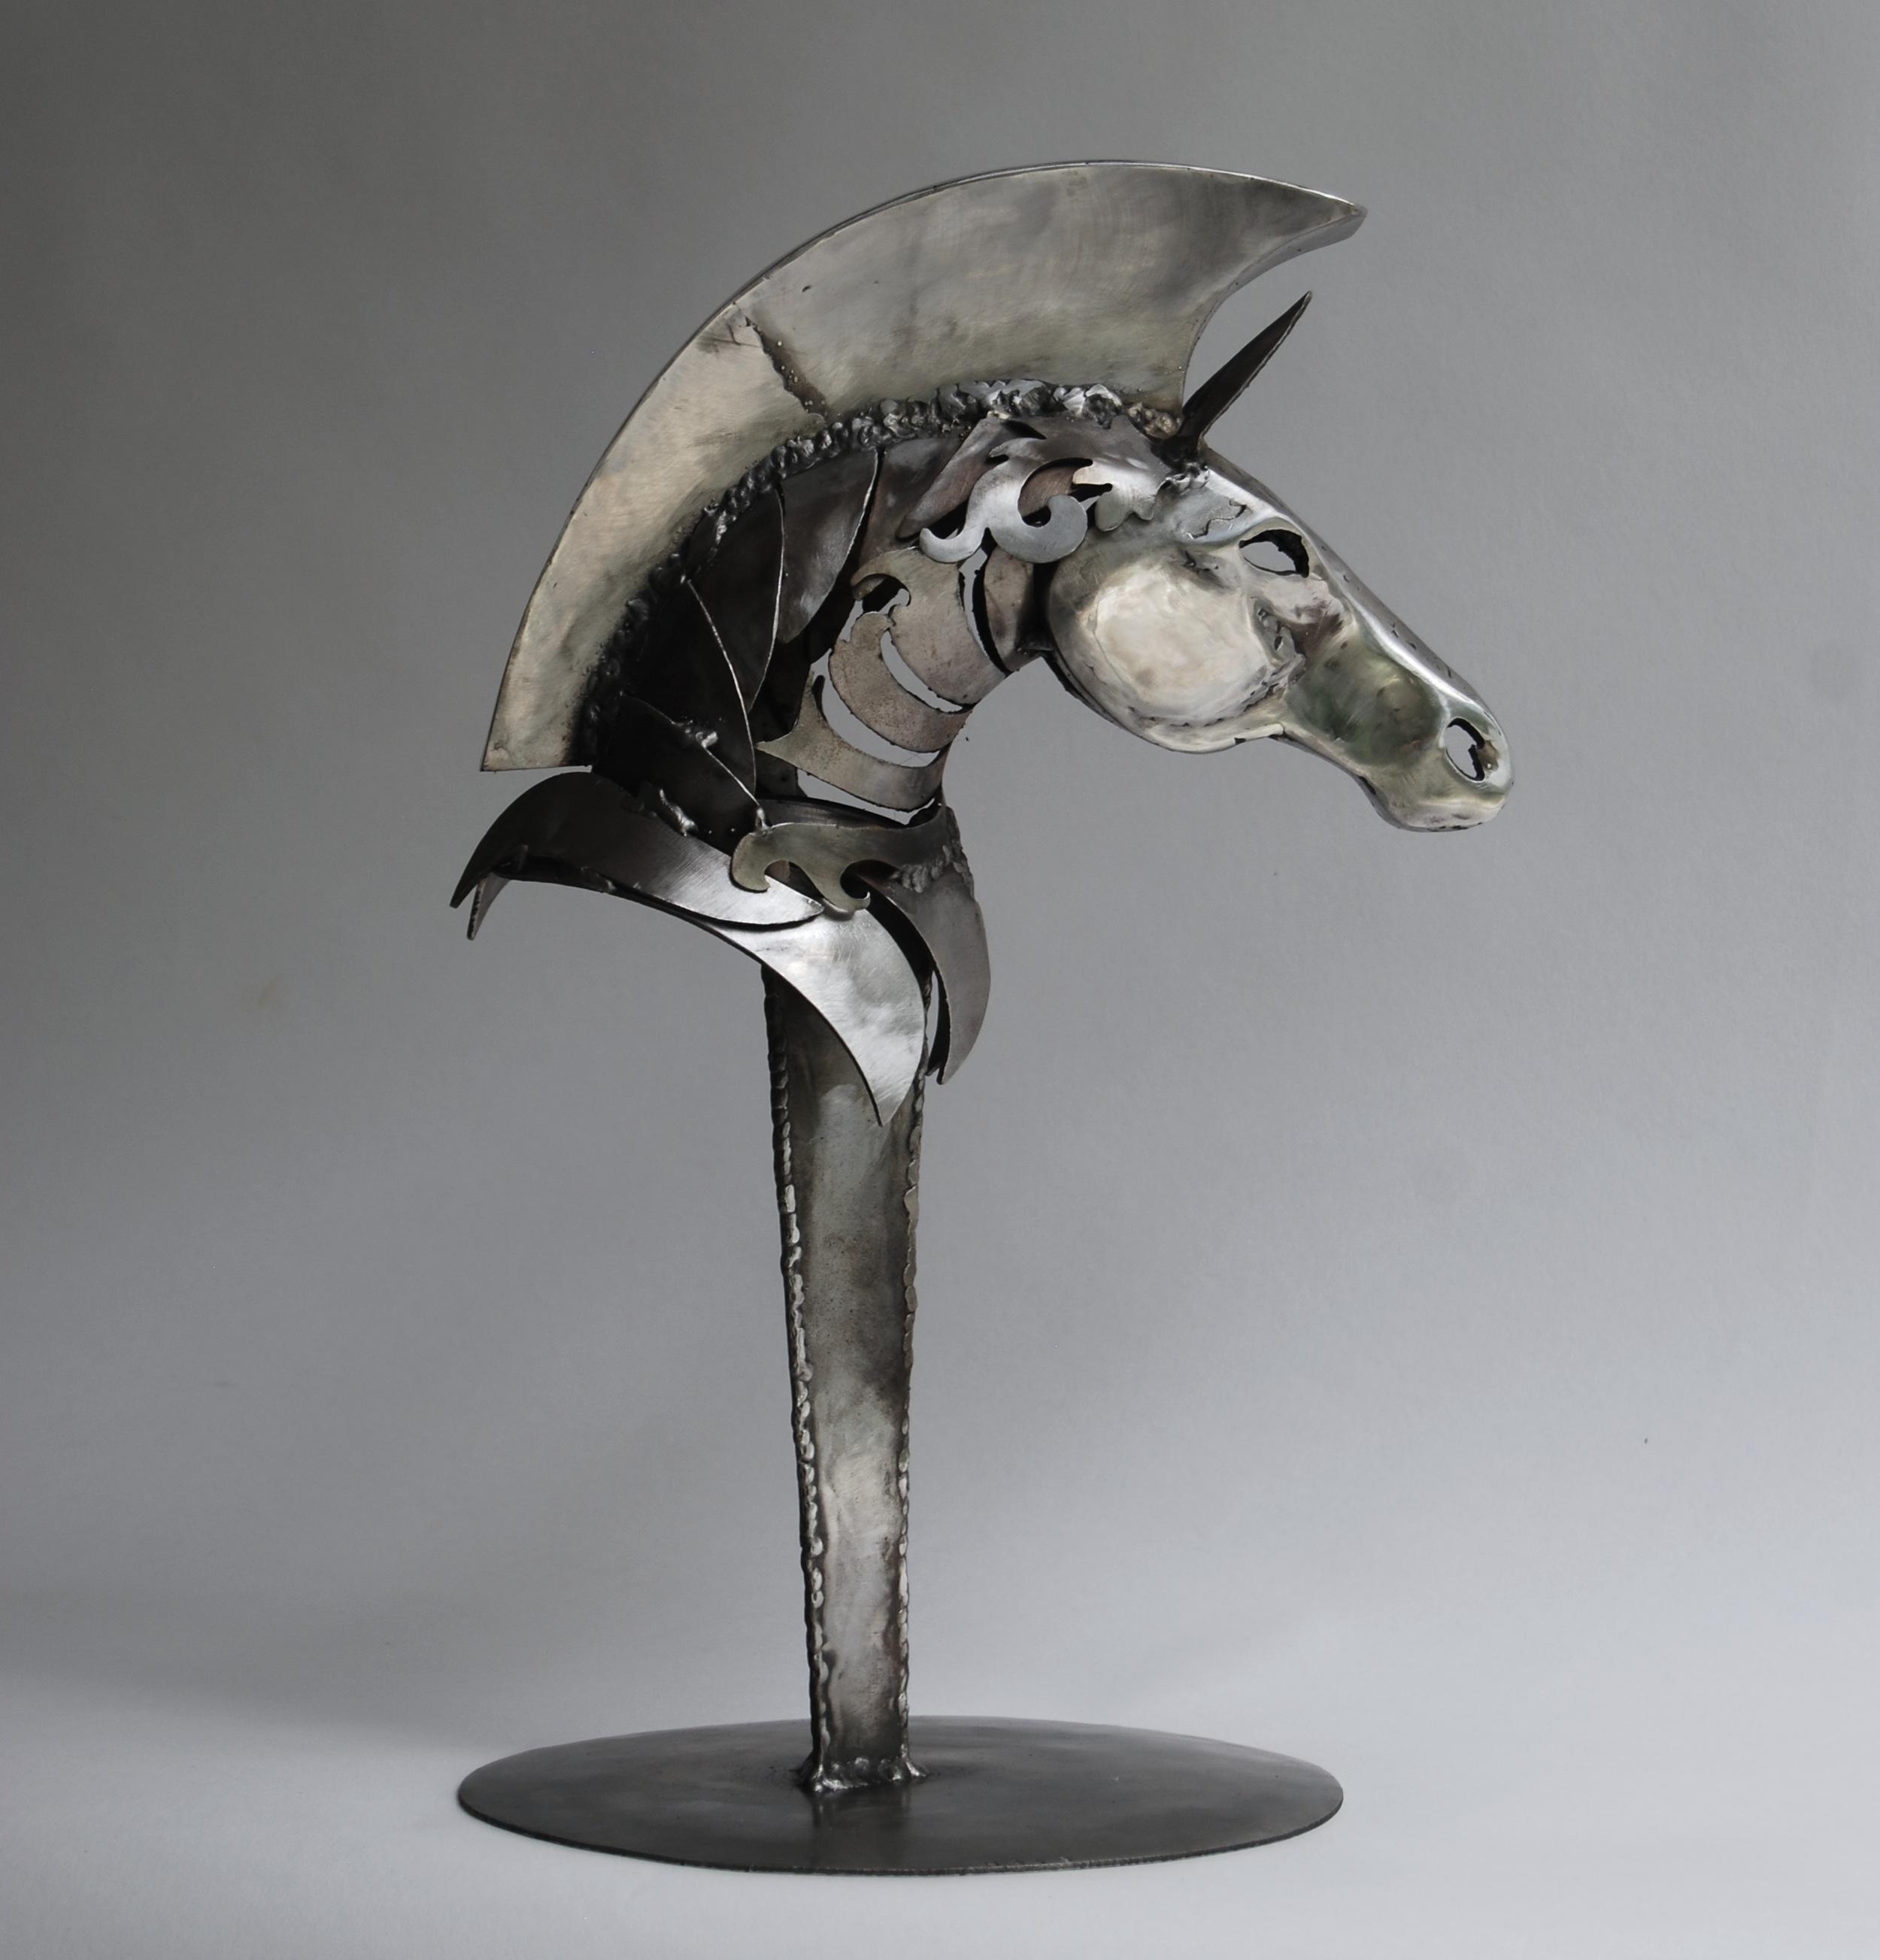 Trojan Horse Sculpture Polished Stainless Approx 11 W X 15 H X 14 D Wildlife Sculpture Public Art Site Specific Metal Art